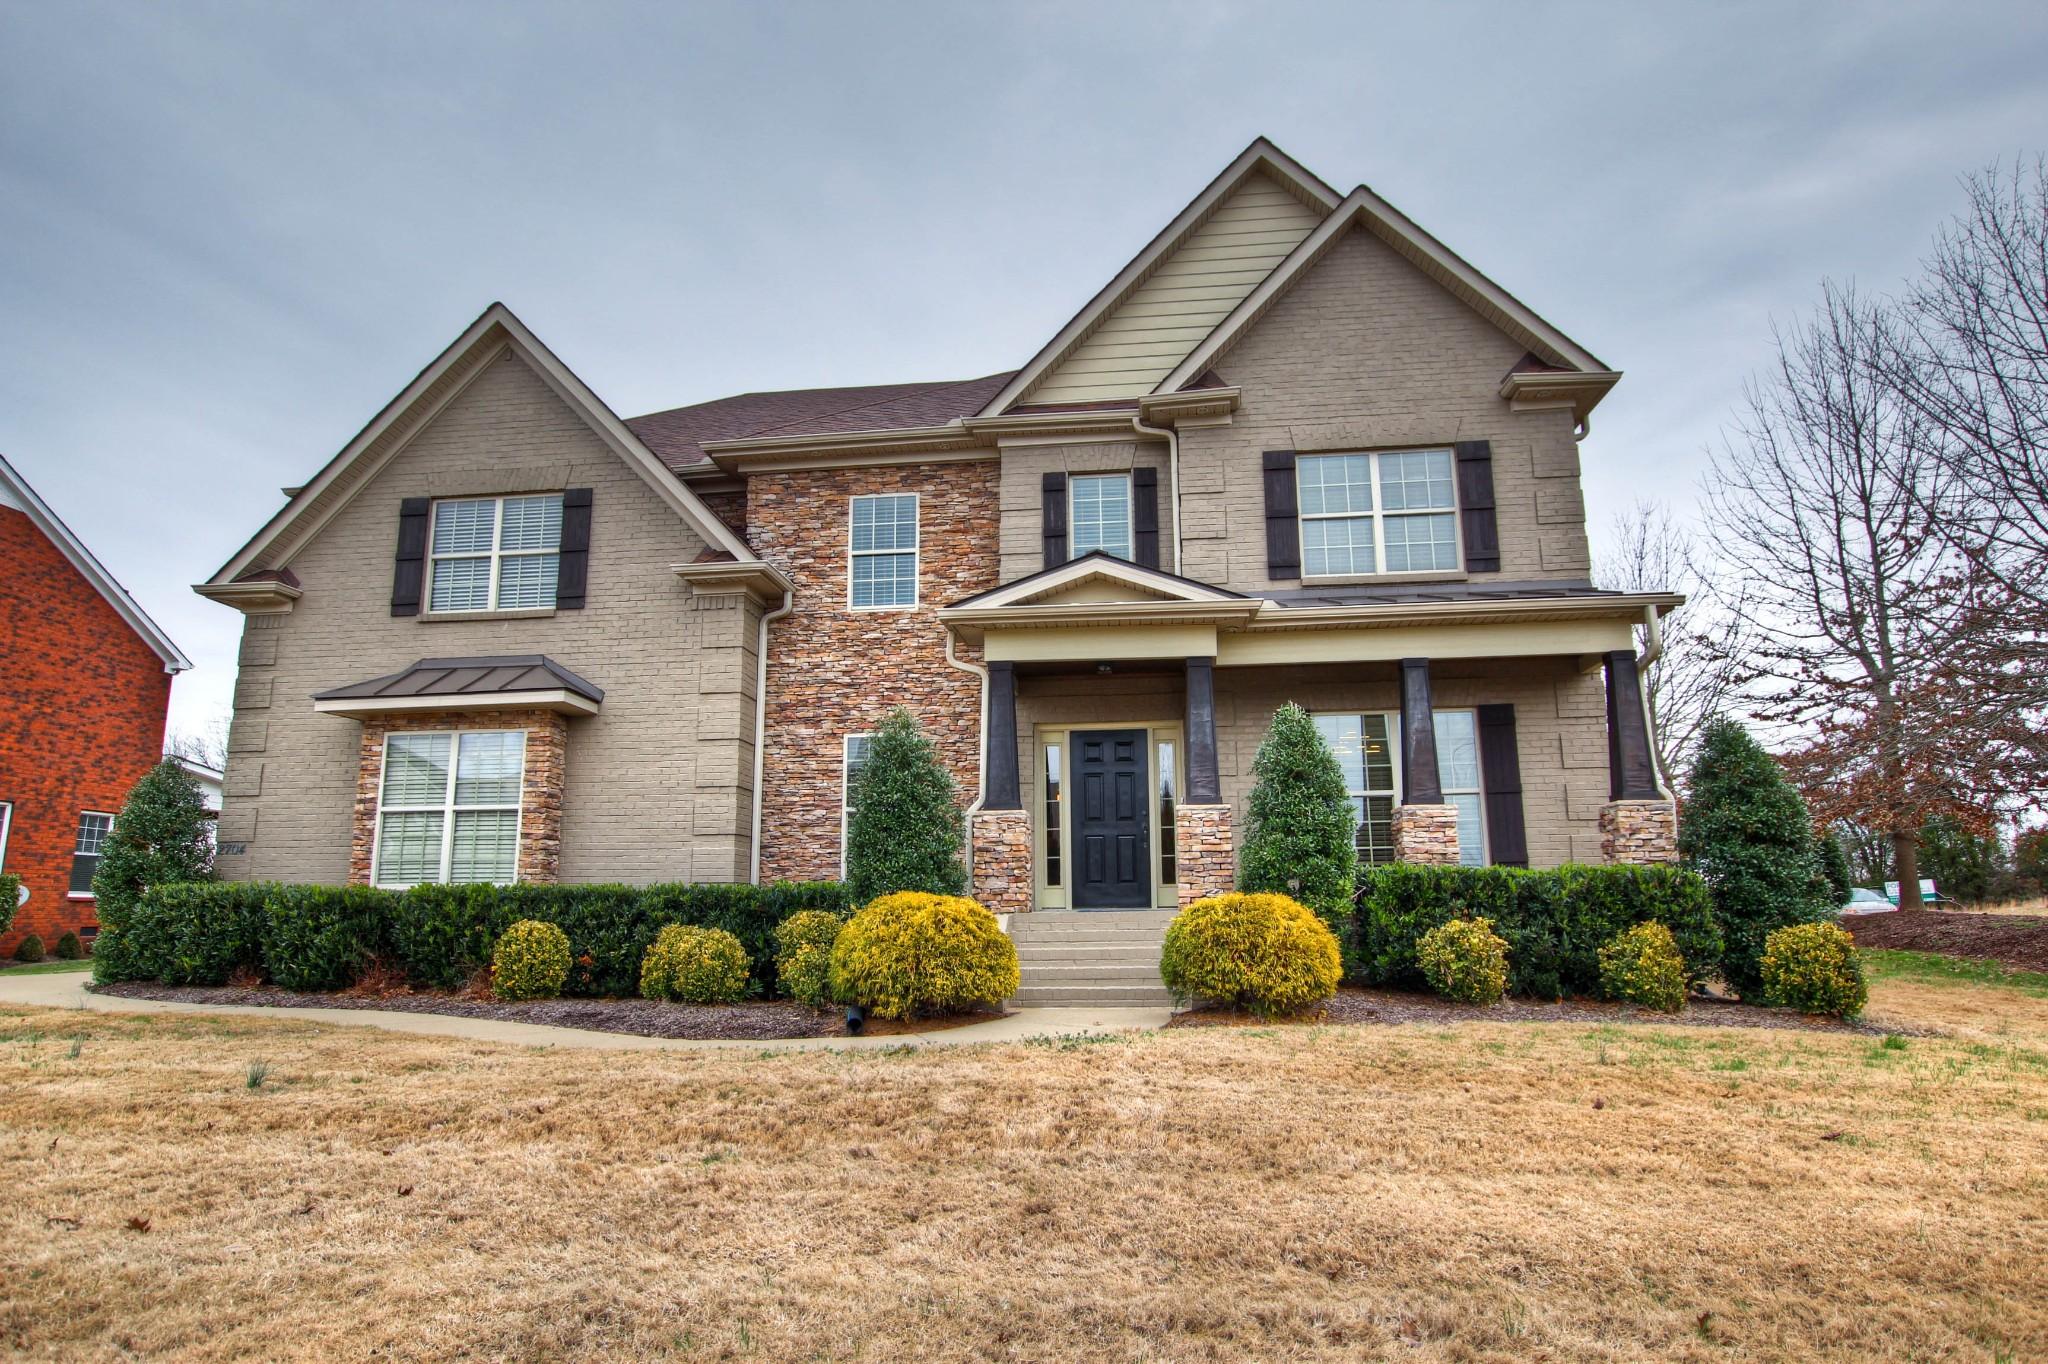 2704 Blooming Oak Pl, Murfreesboro, TN 37130 - Murfreesboro, TN real estate listing